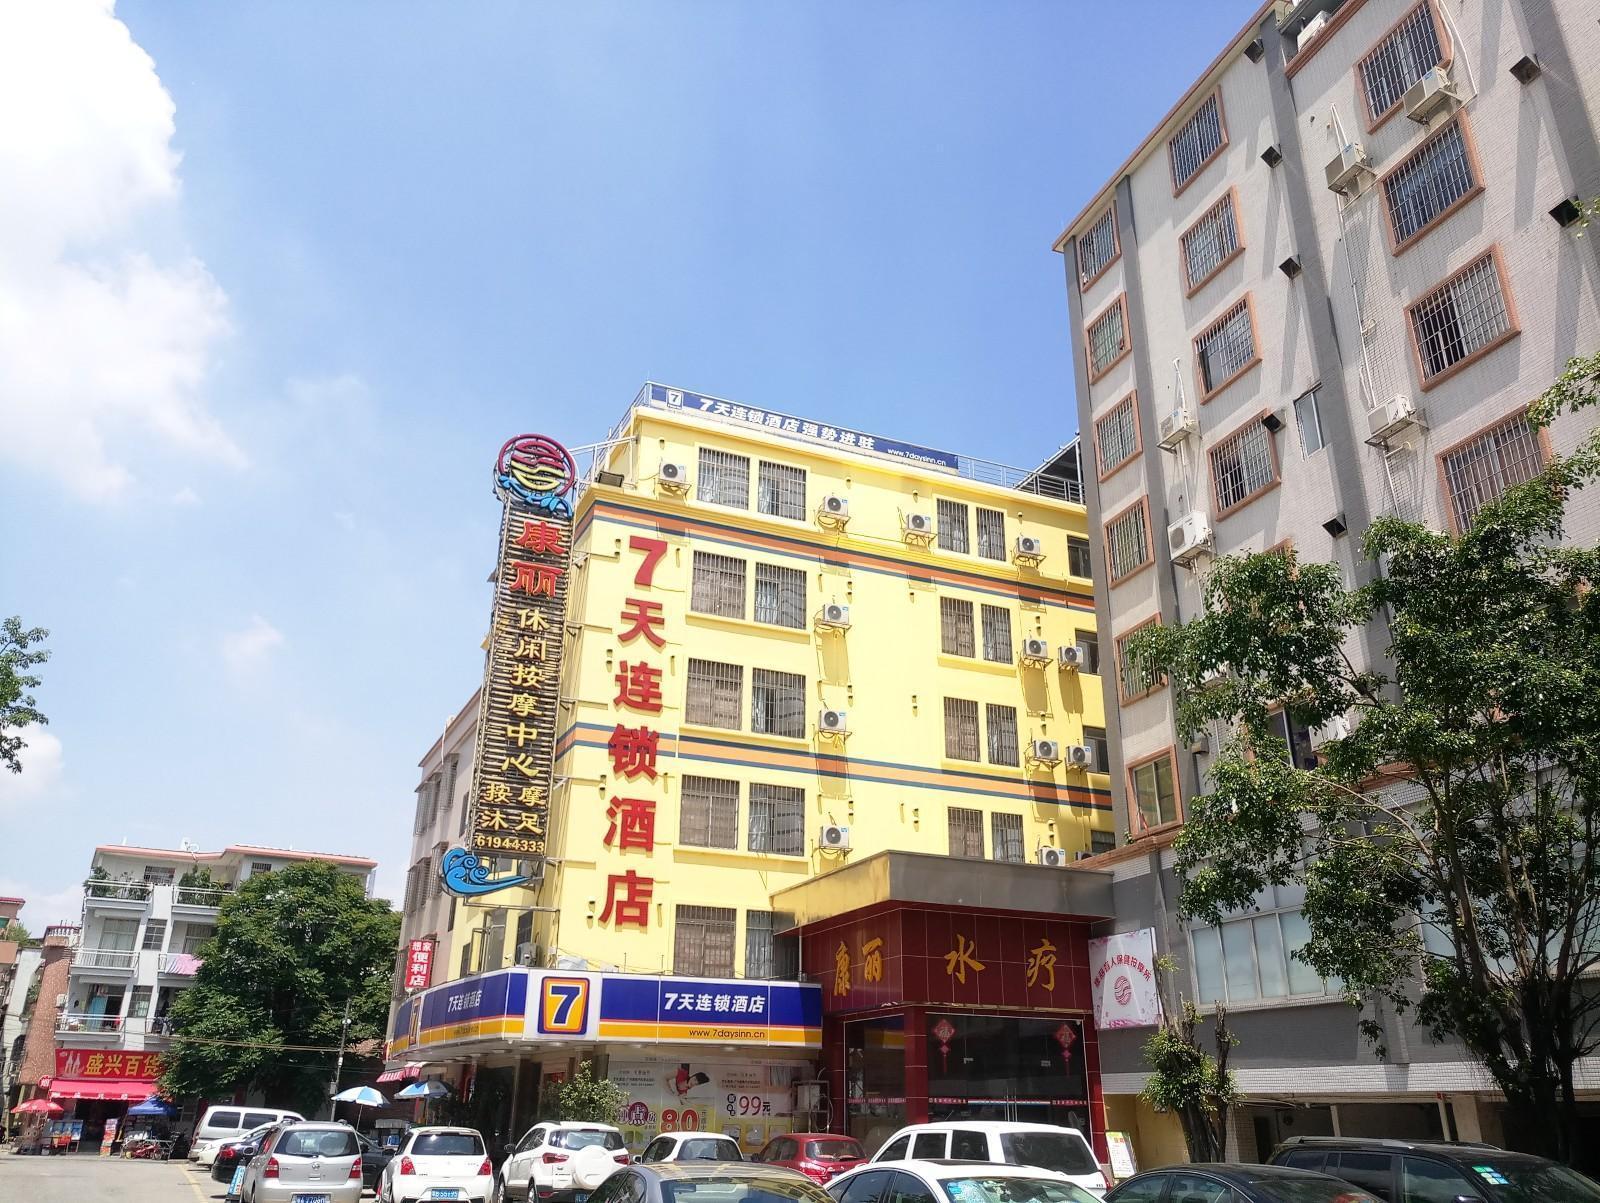 7Days Inn Guangzhou Panyu Bus Passenger Station Branch